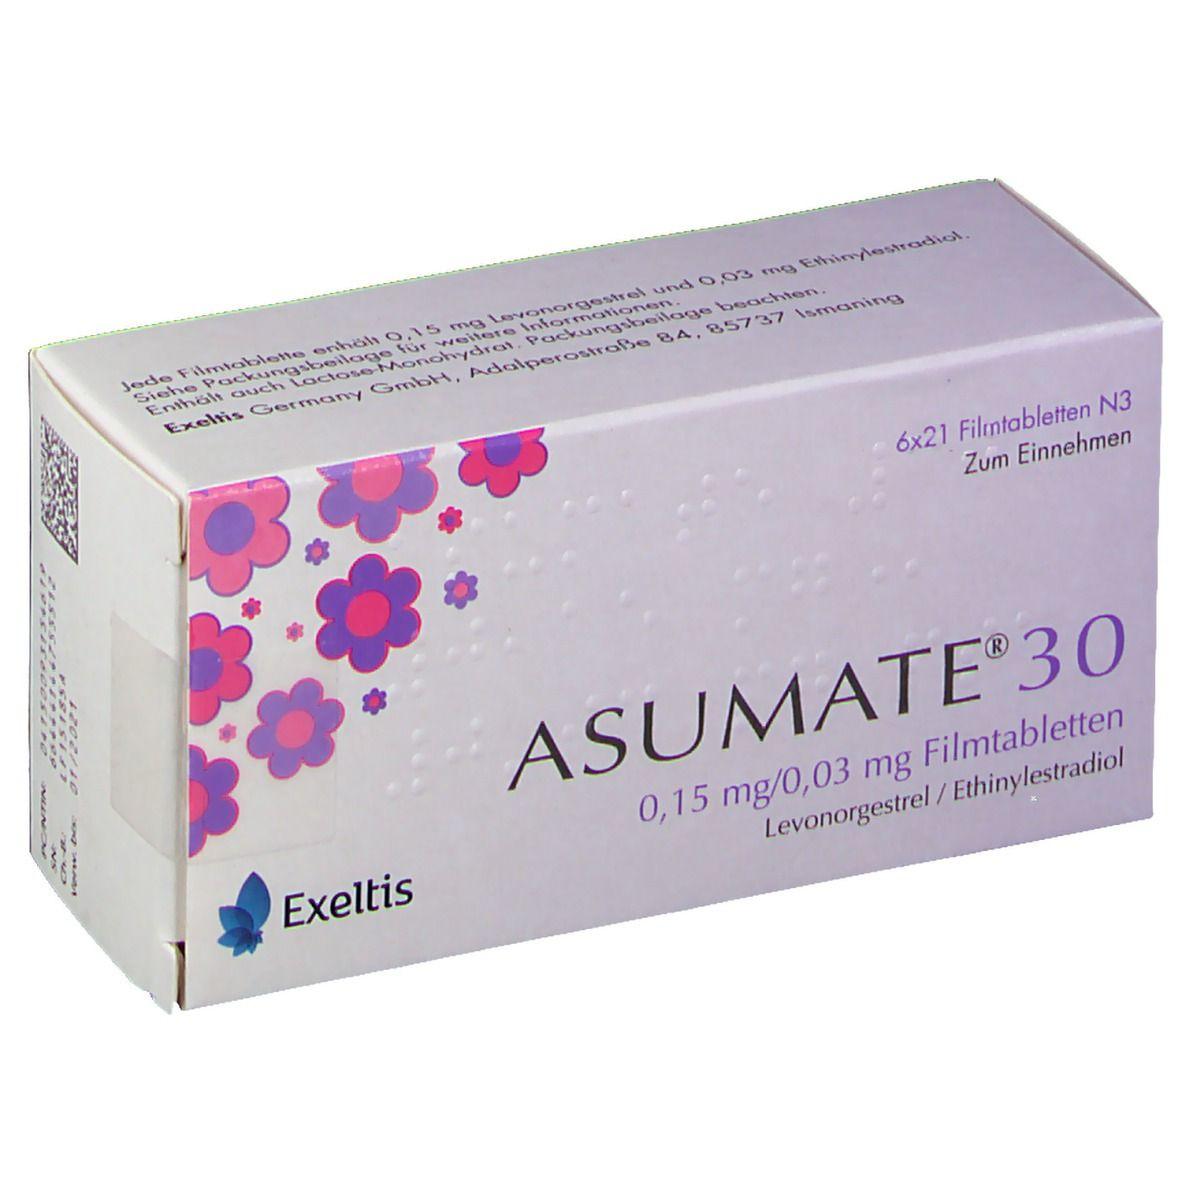 30 gewichtszunahme asumate Signs and